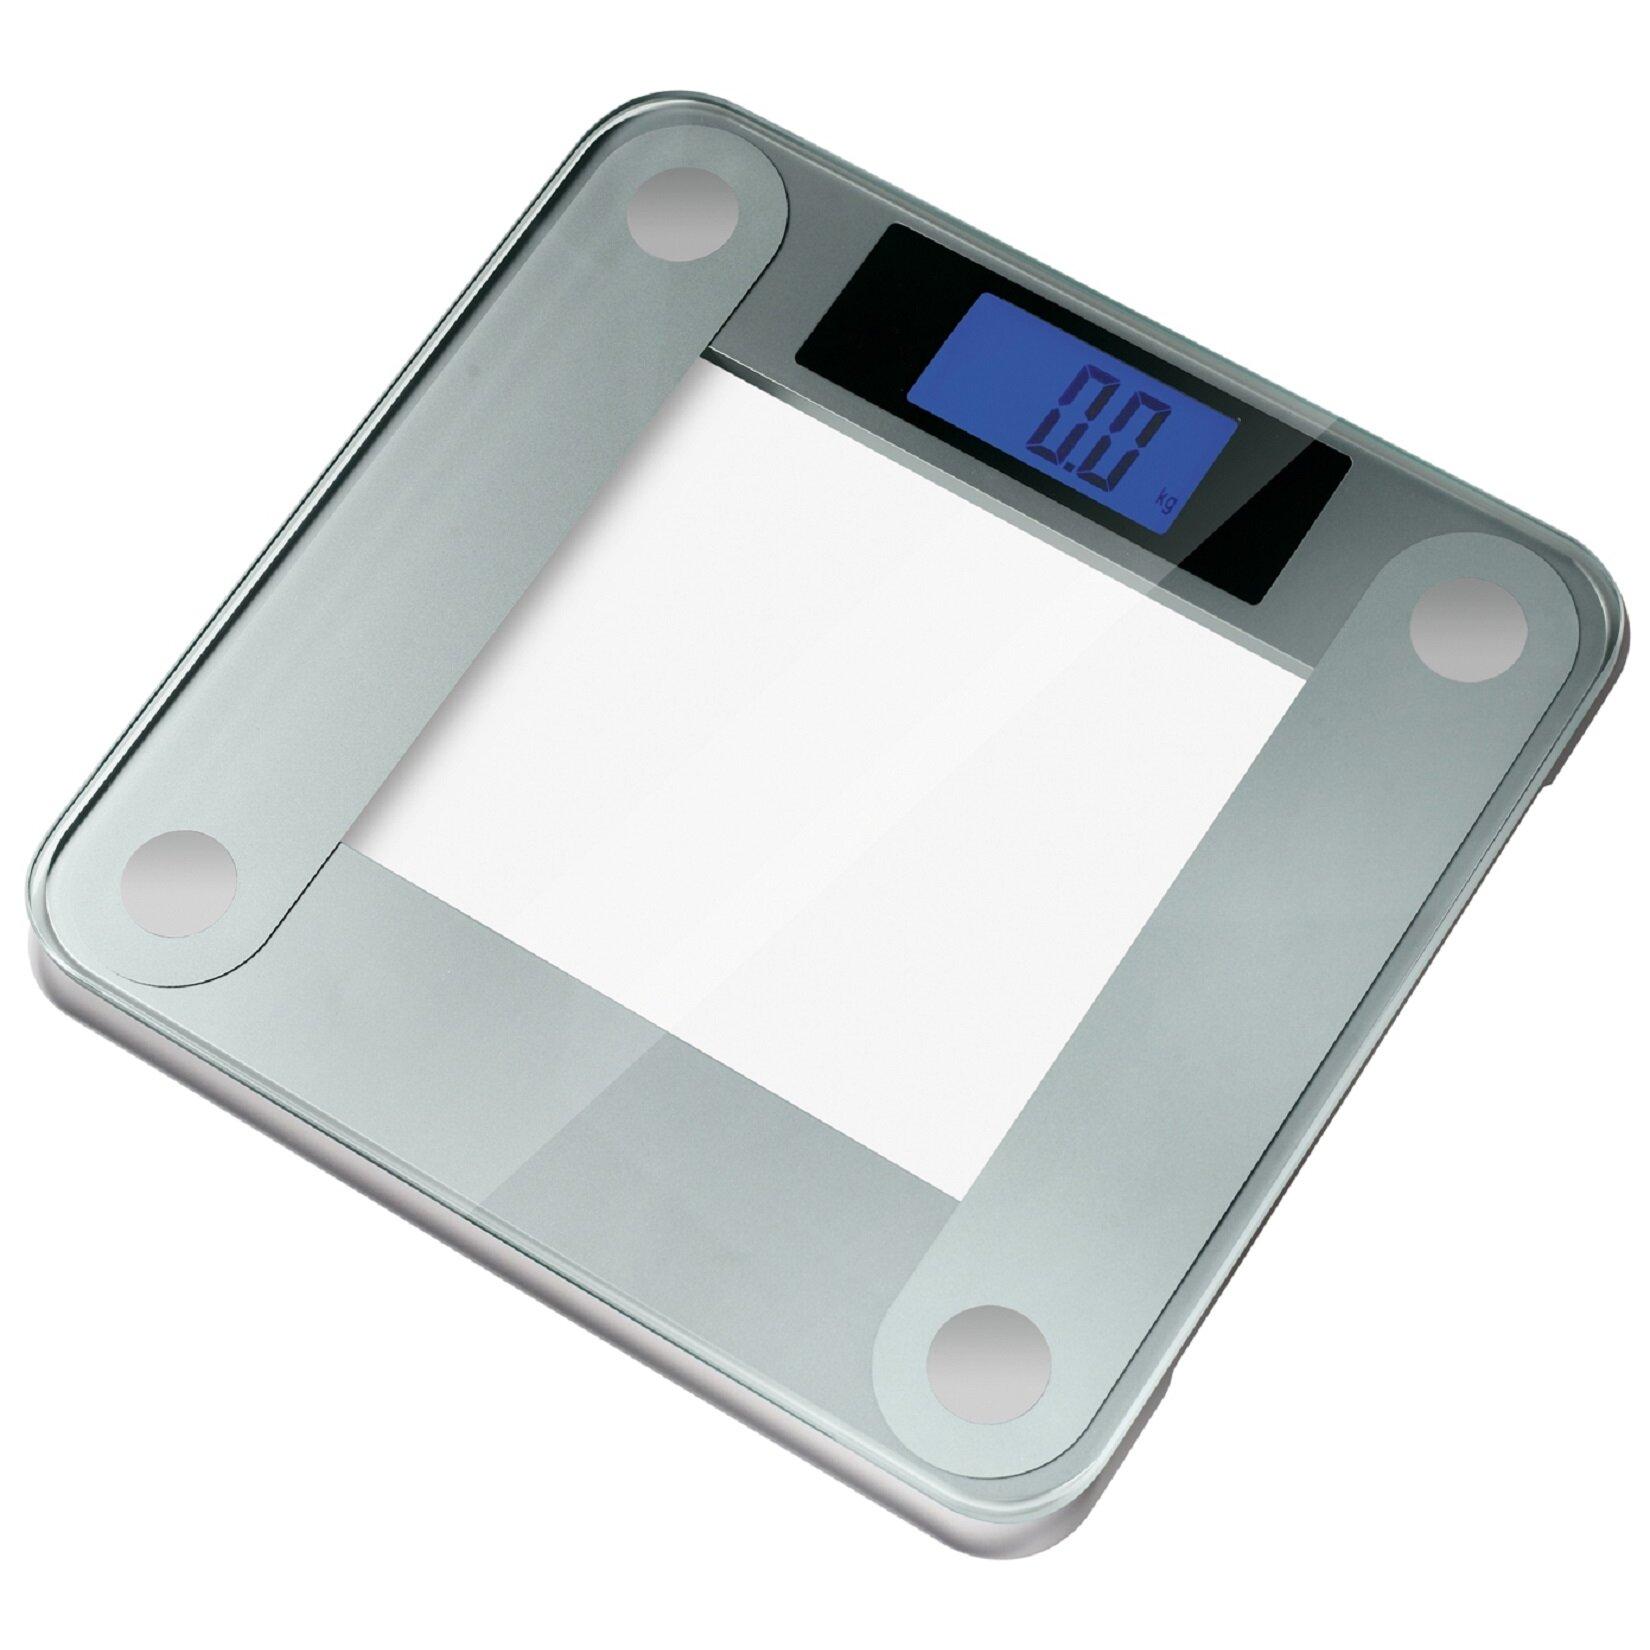 Ozeri Precision II Digital Bathroom Scale 440 lbs Capacity with. Eatsmart Precision Digital Bathroom Scale Silver